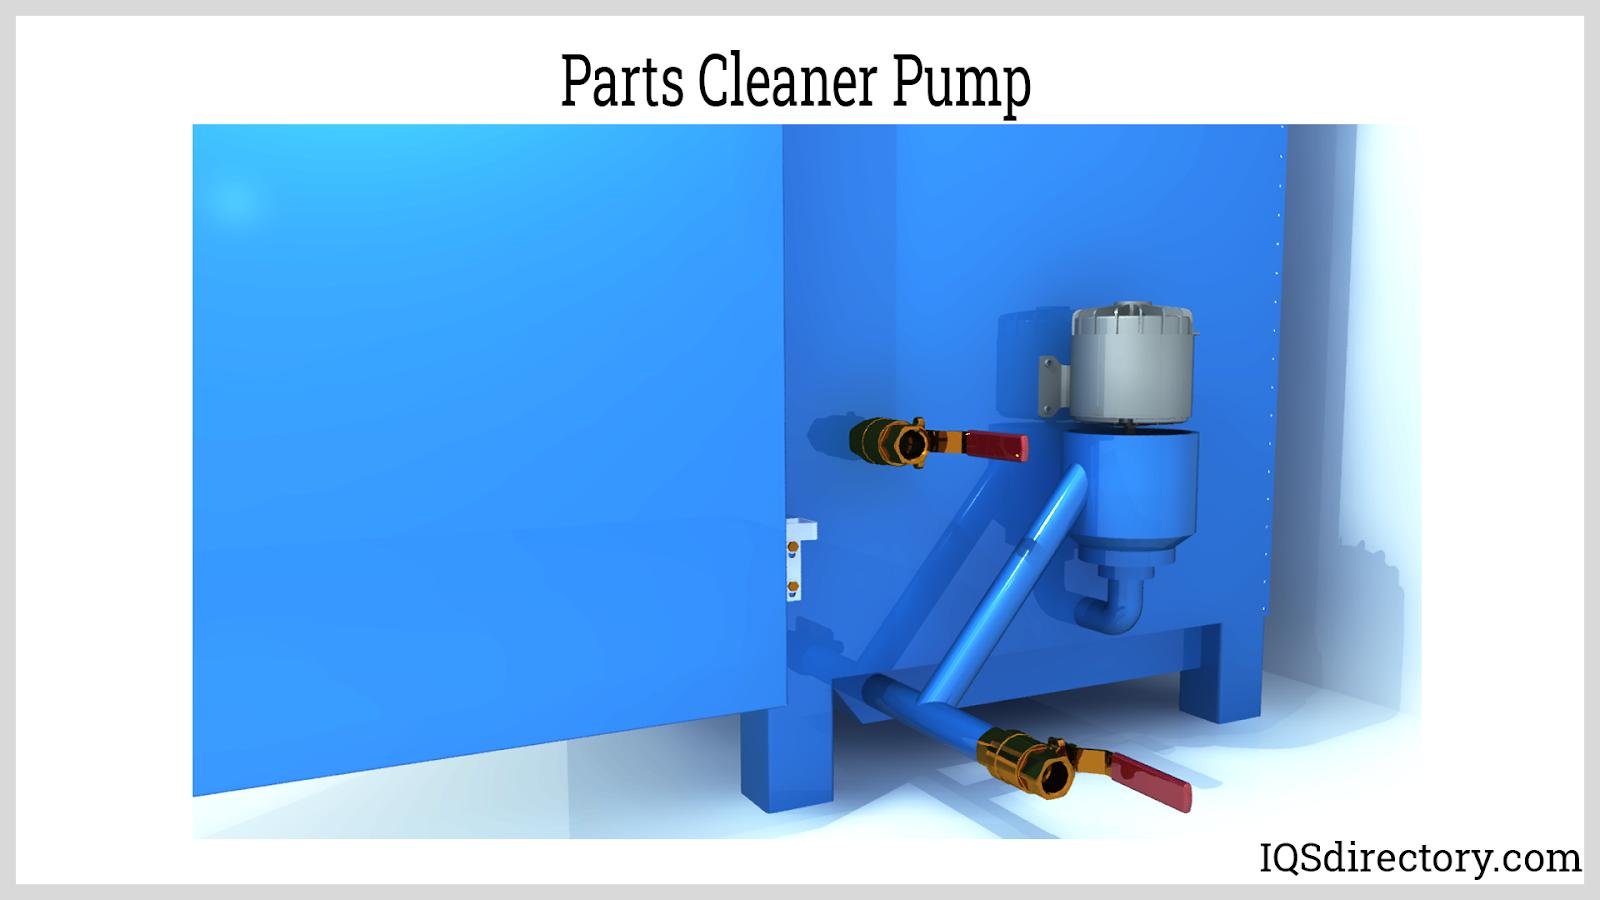 Parts Cleaner Pump